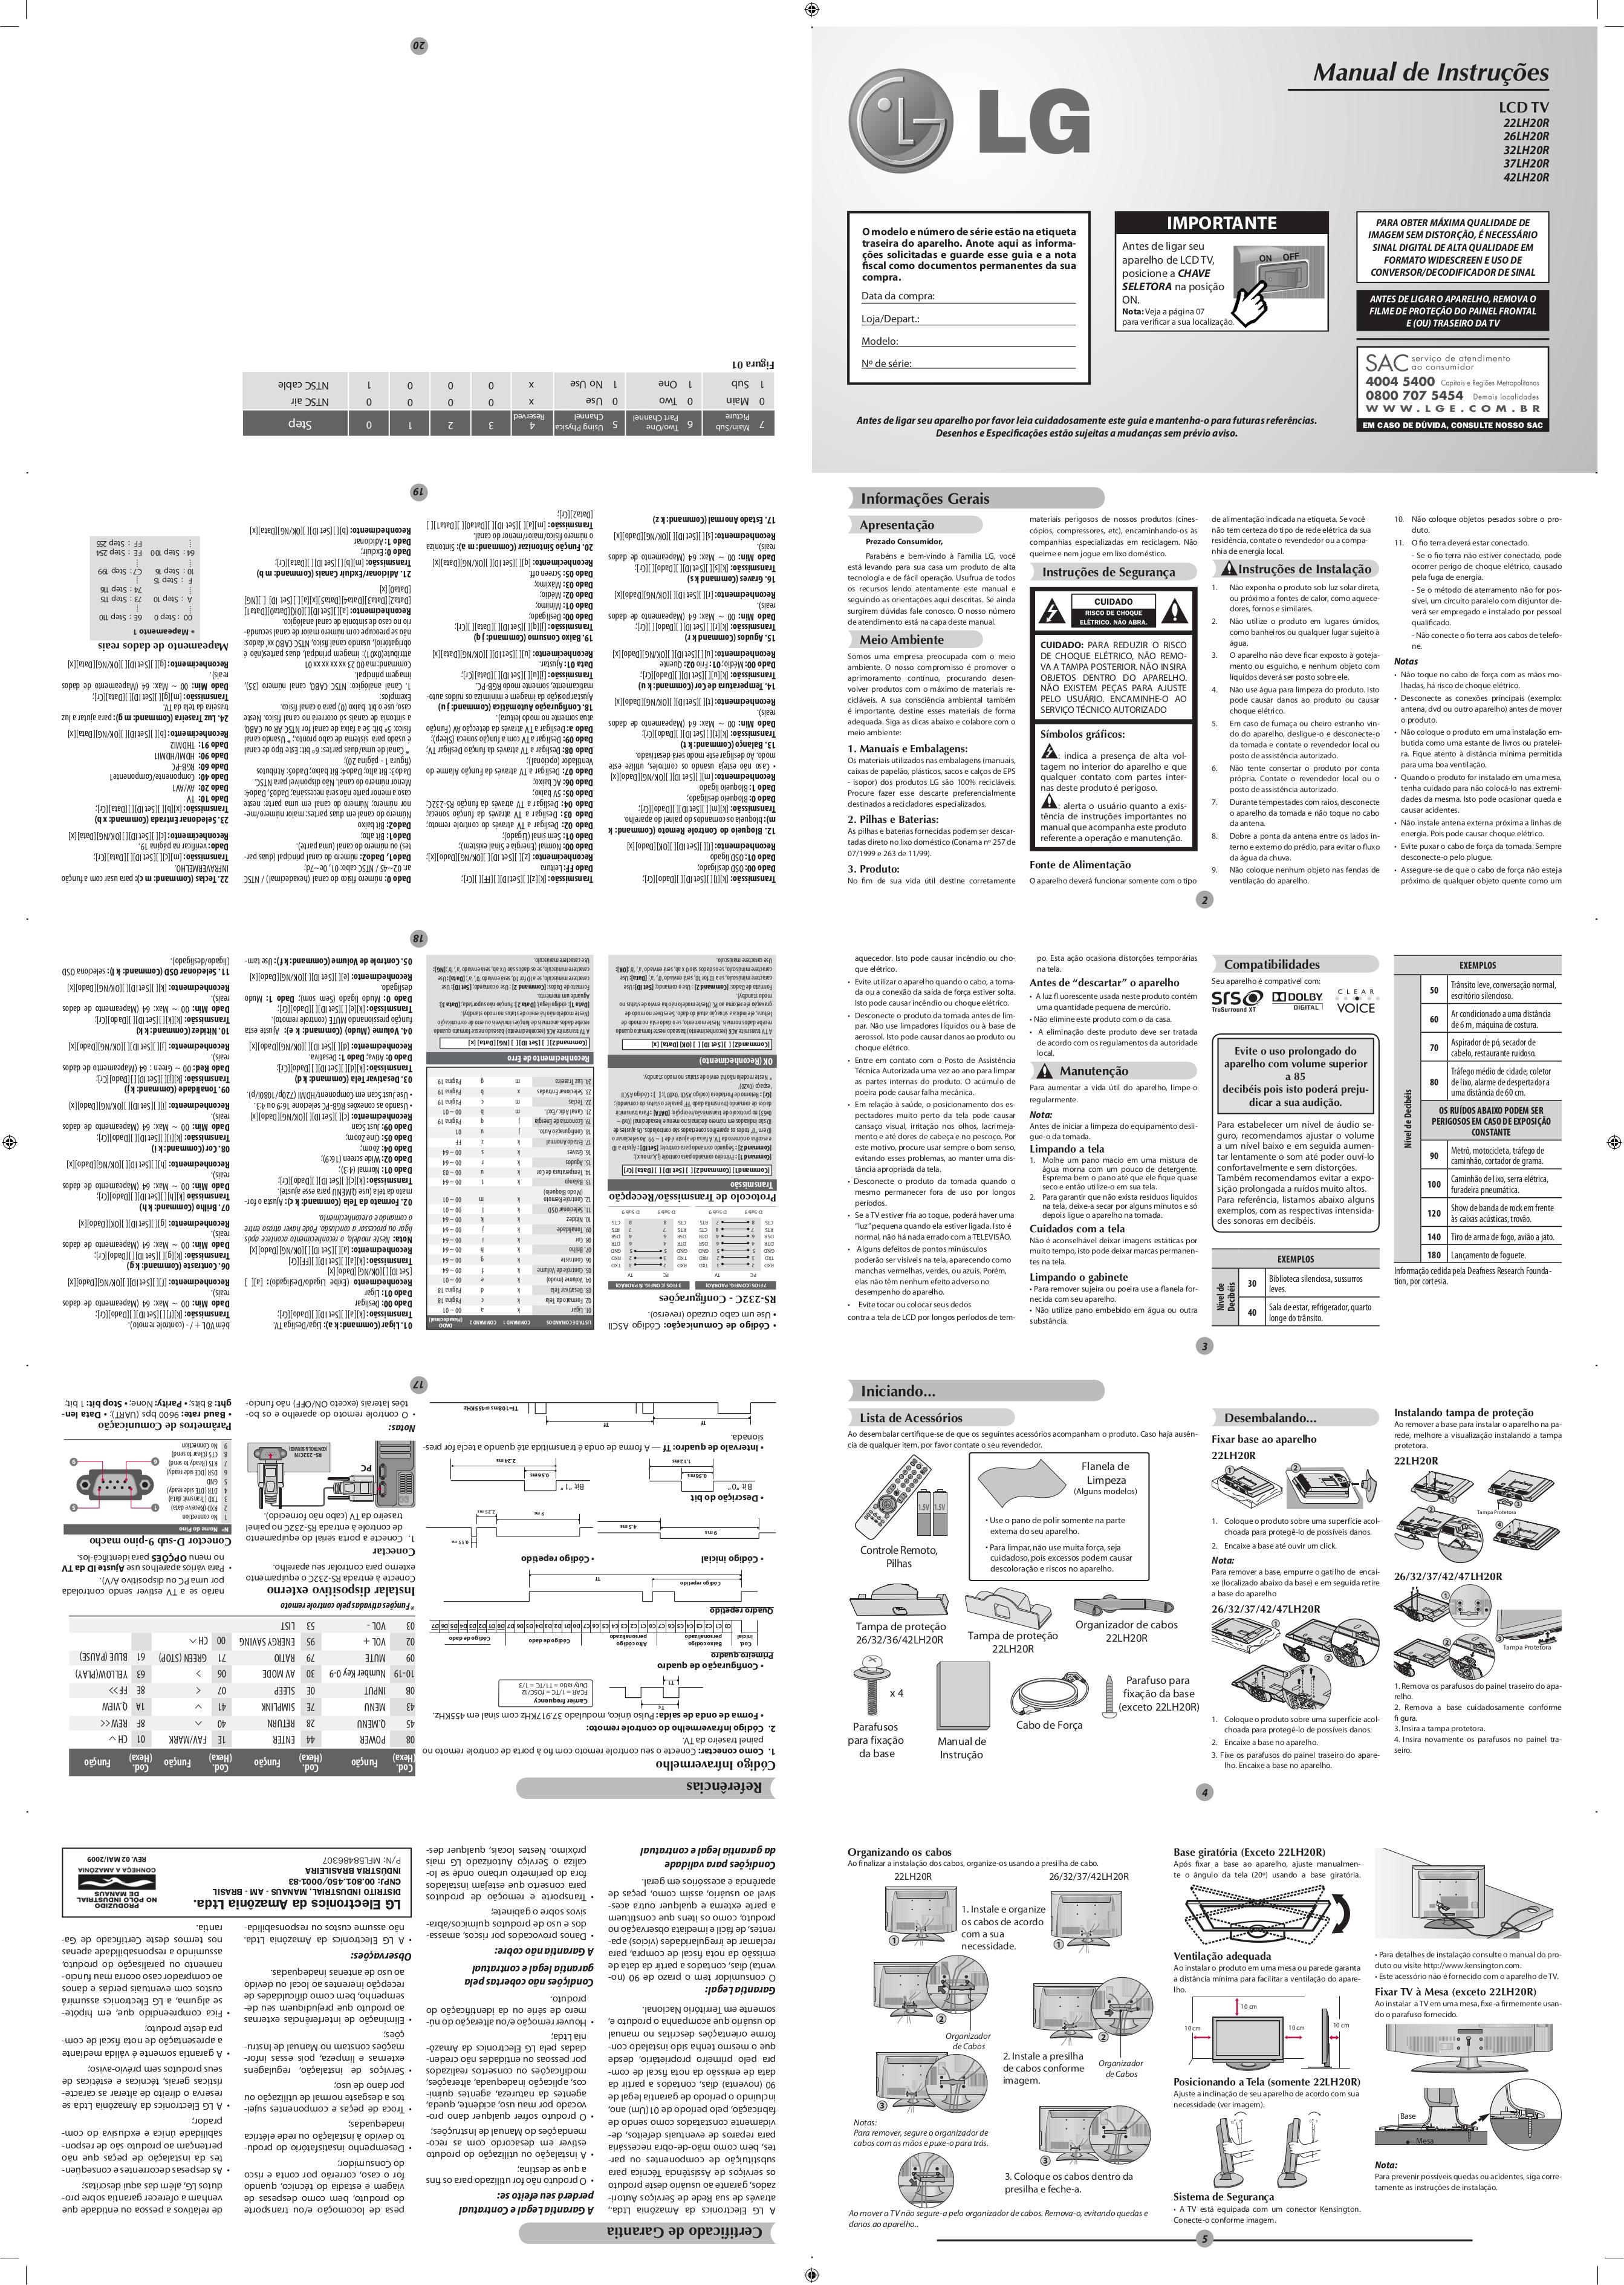 Lg gl-b282 vl user guide manual pdf fridge freezer manual.